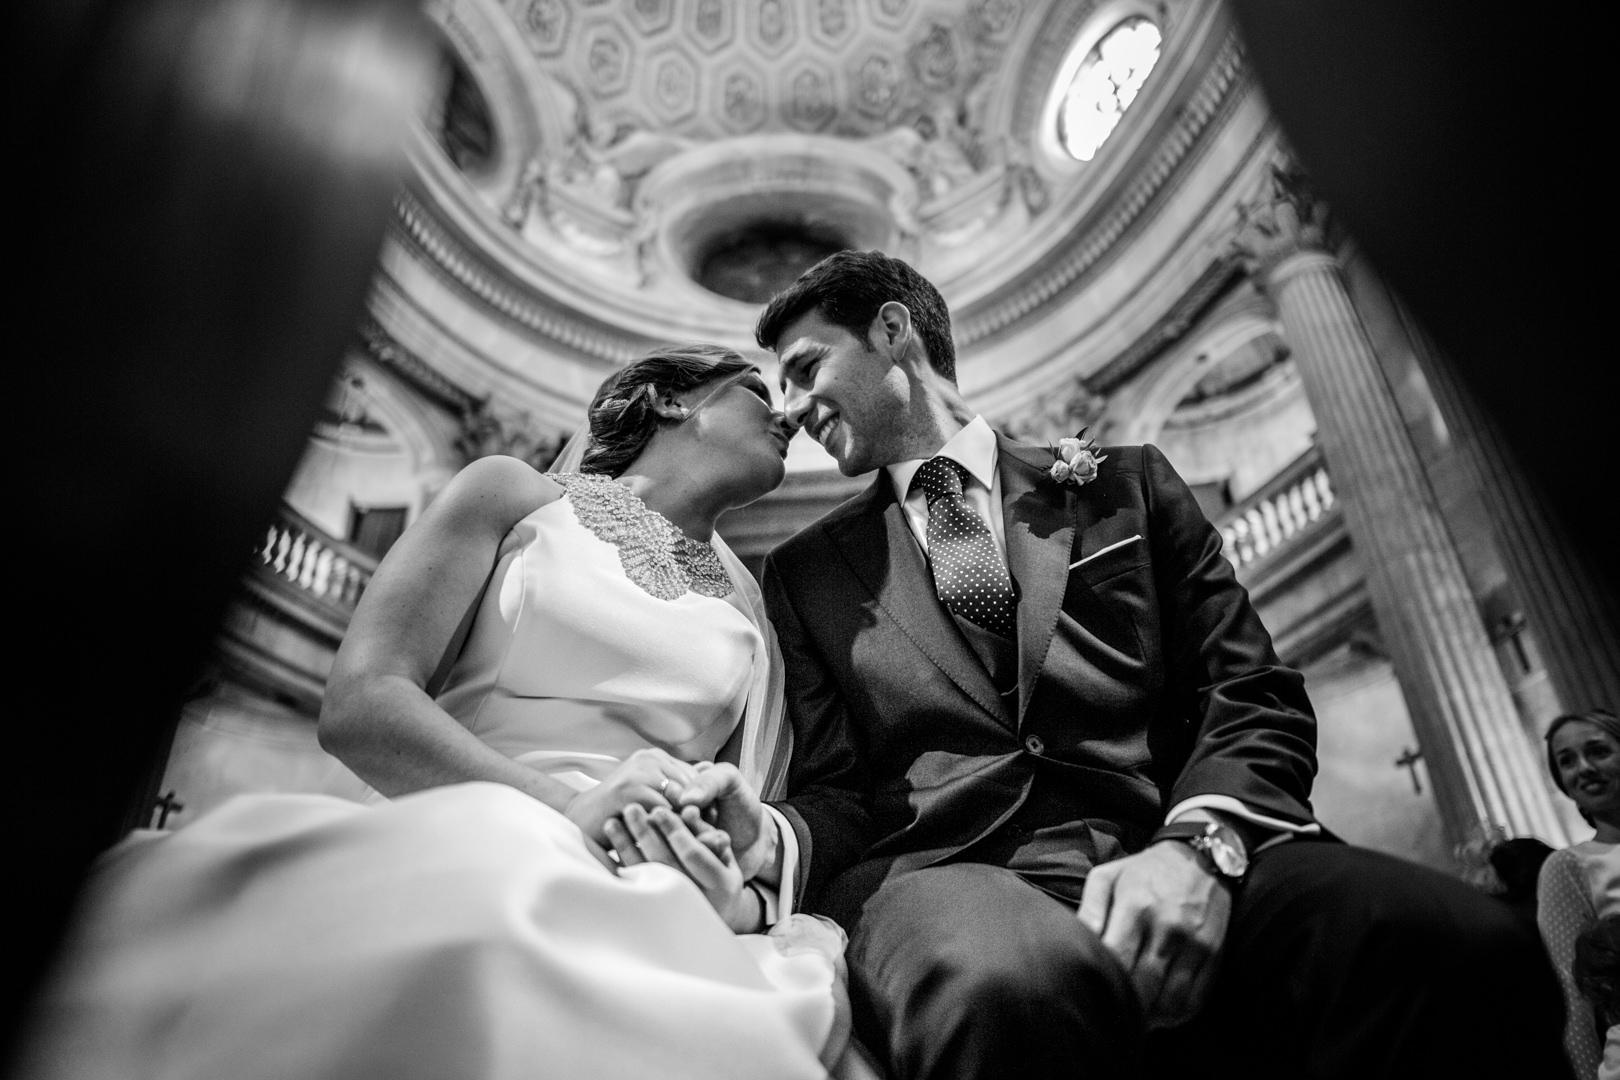 Boda-Catedral-Jaen-Hamburgo-Maria-David-engagement-Rafael-Torres-fotografo-bodas-sevilla-madrid-barcelona-wedding-photographer--25.jpg